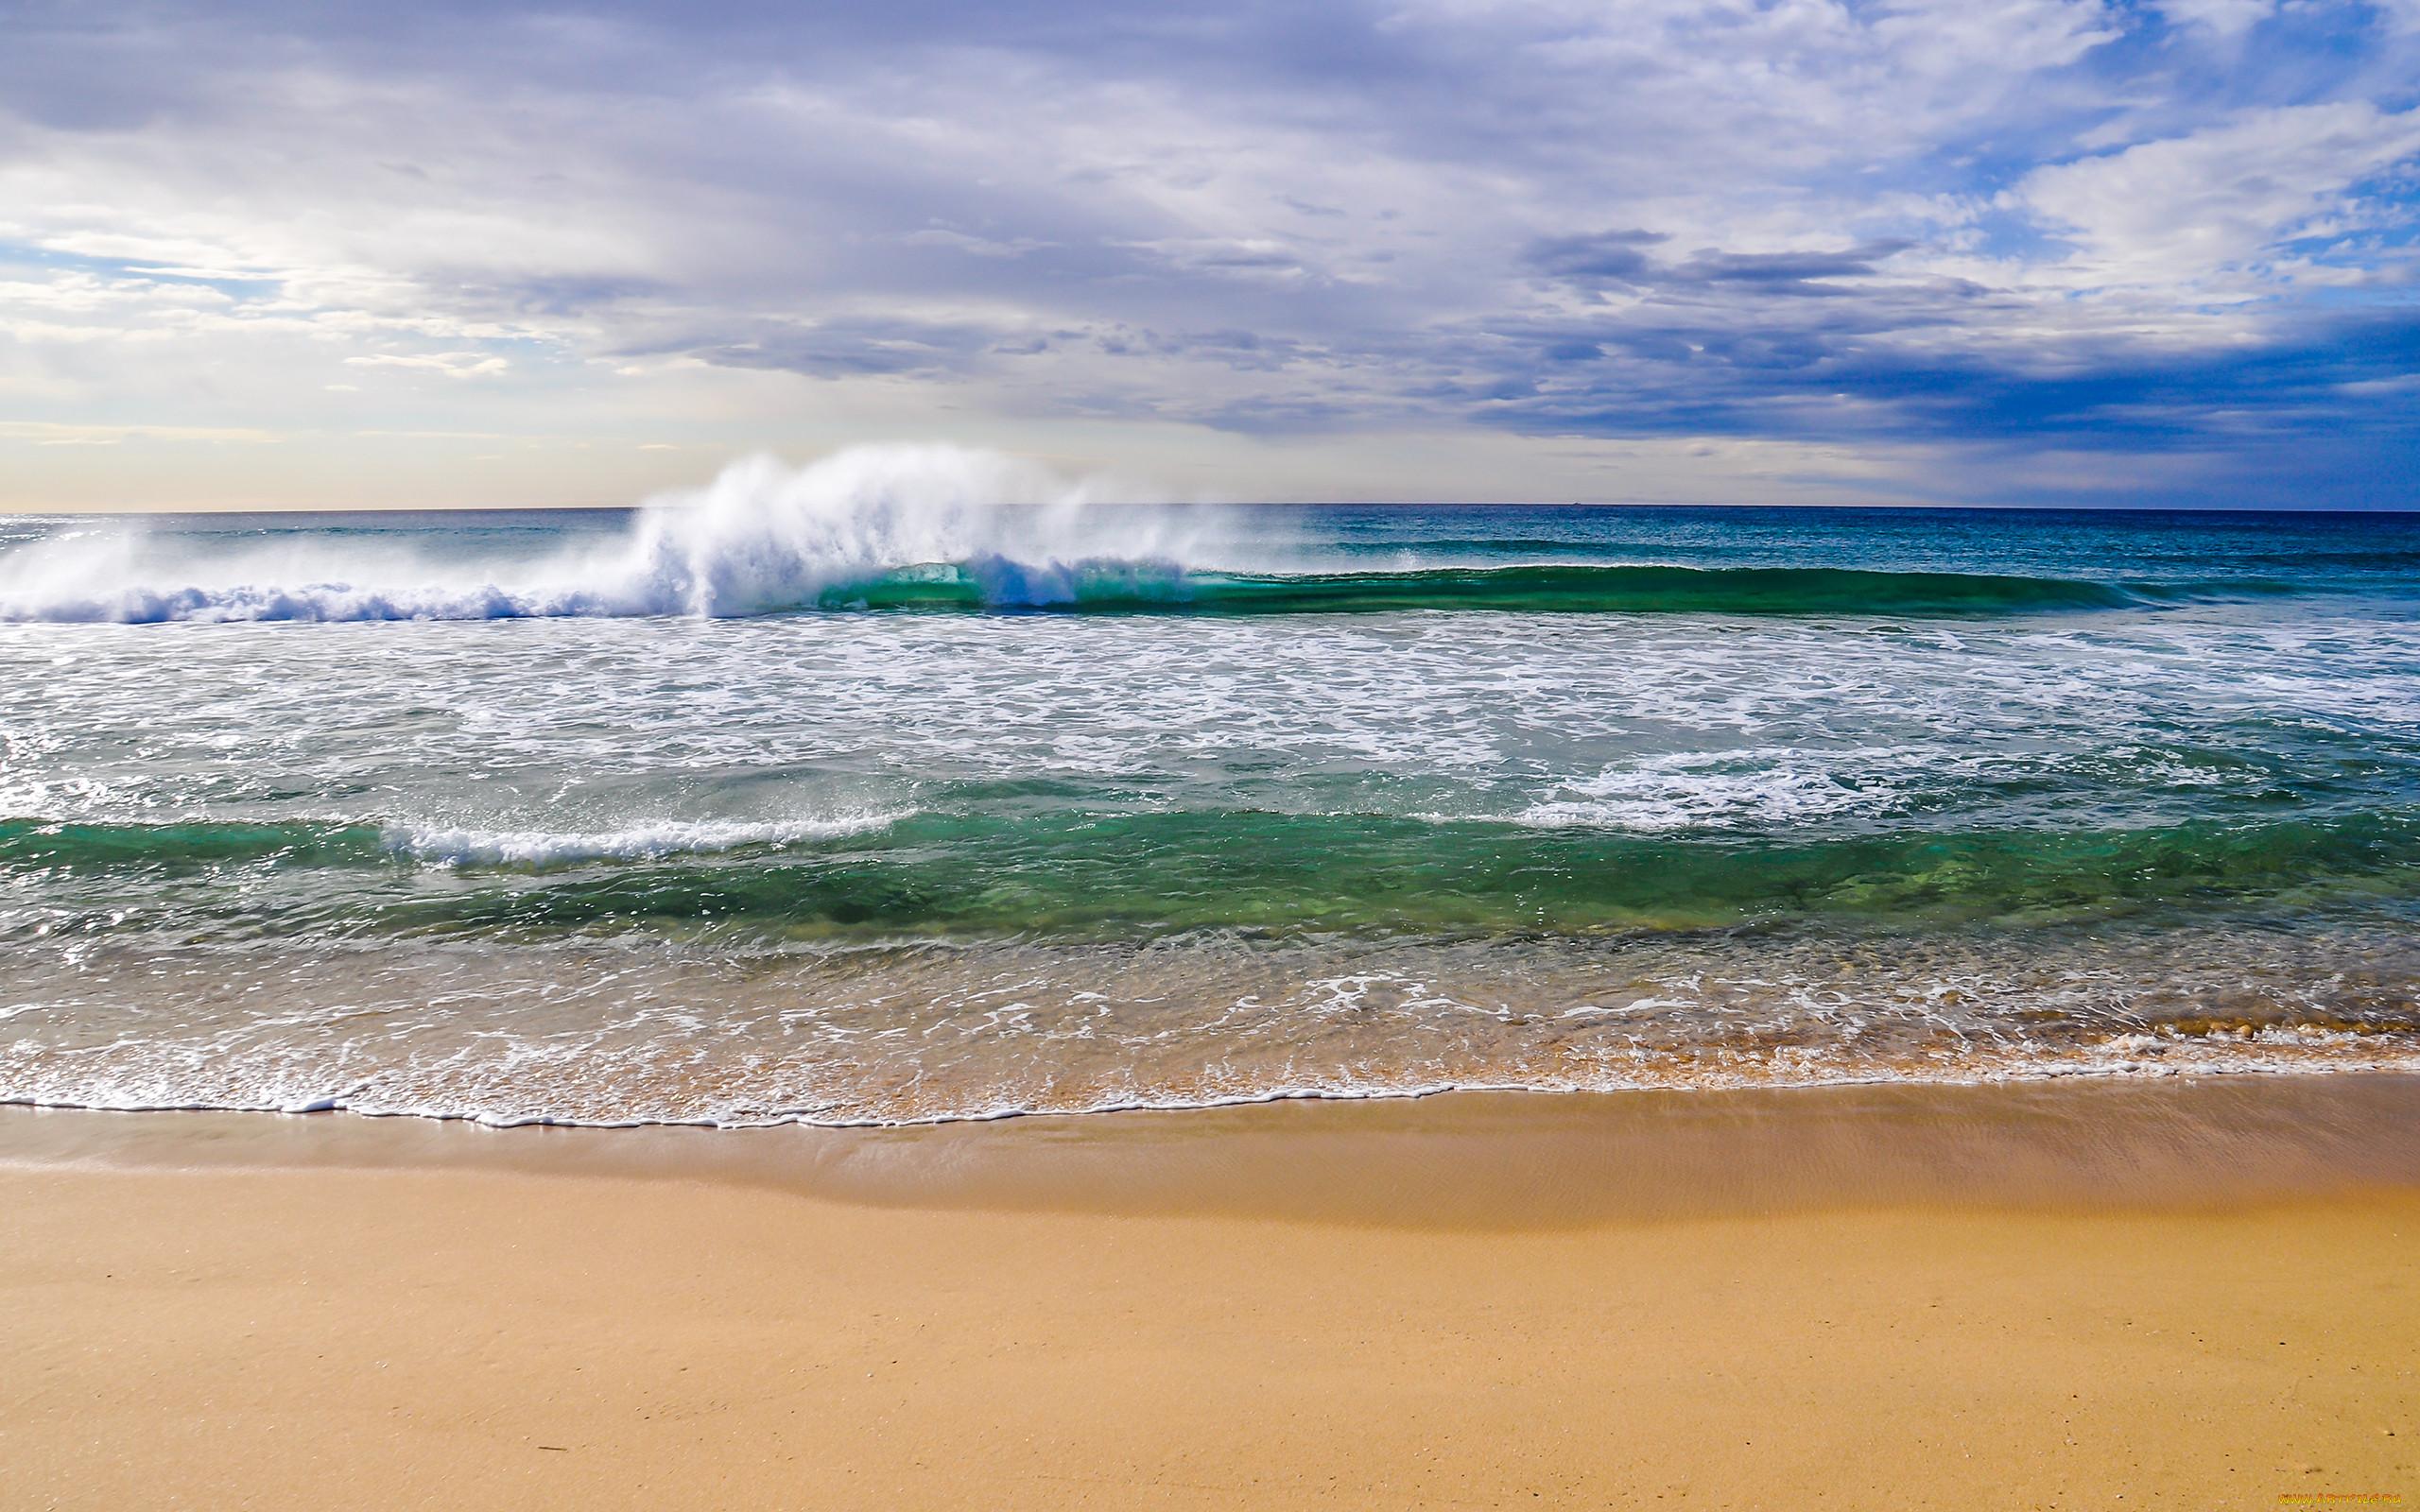 Океан в картинках слайд шоу